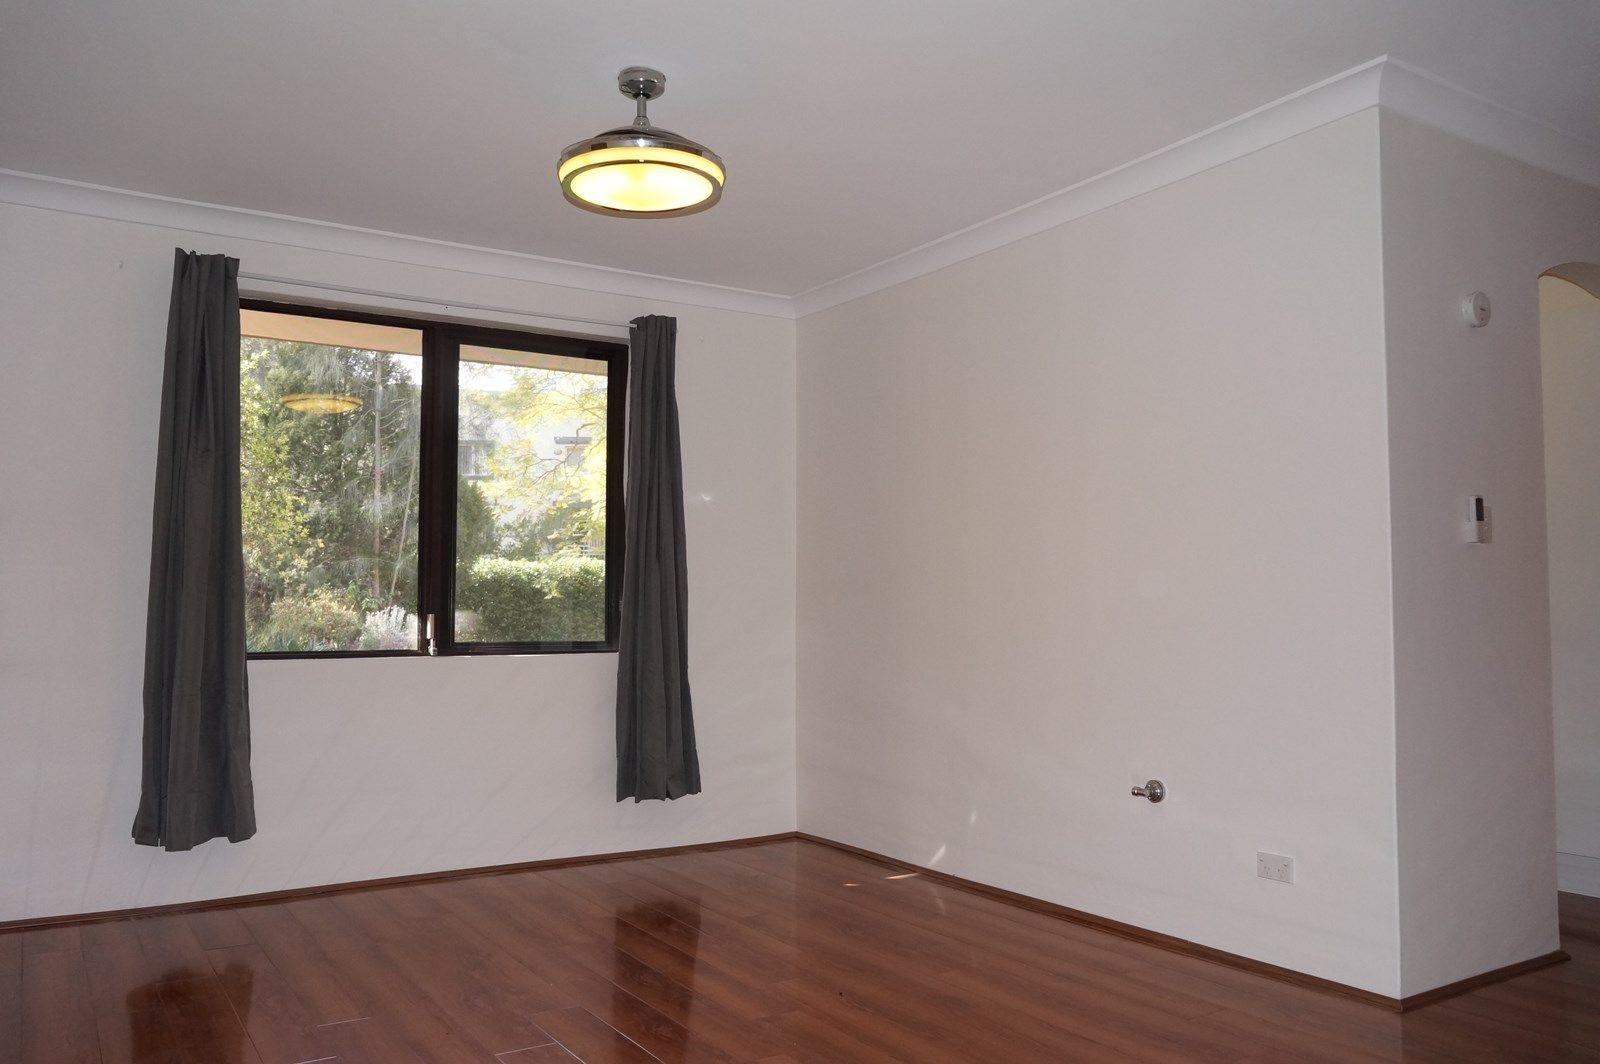 7/12-14 Pennant Hills Road, North Parramatta NSW 2151, Image 2